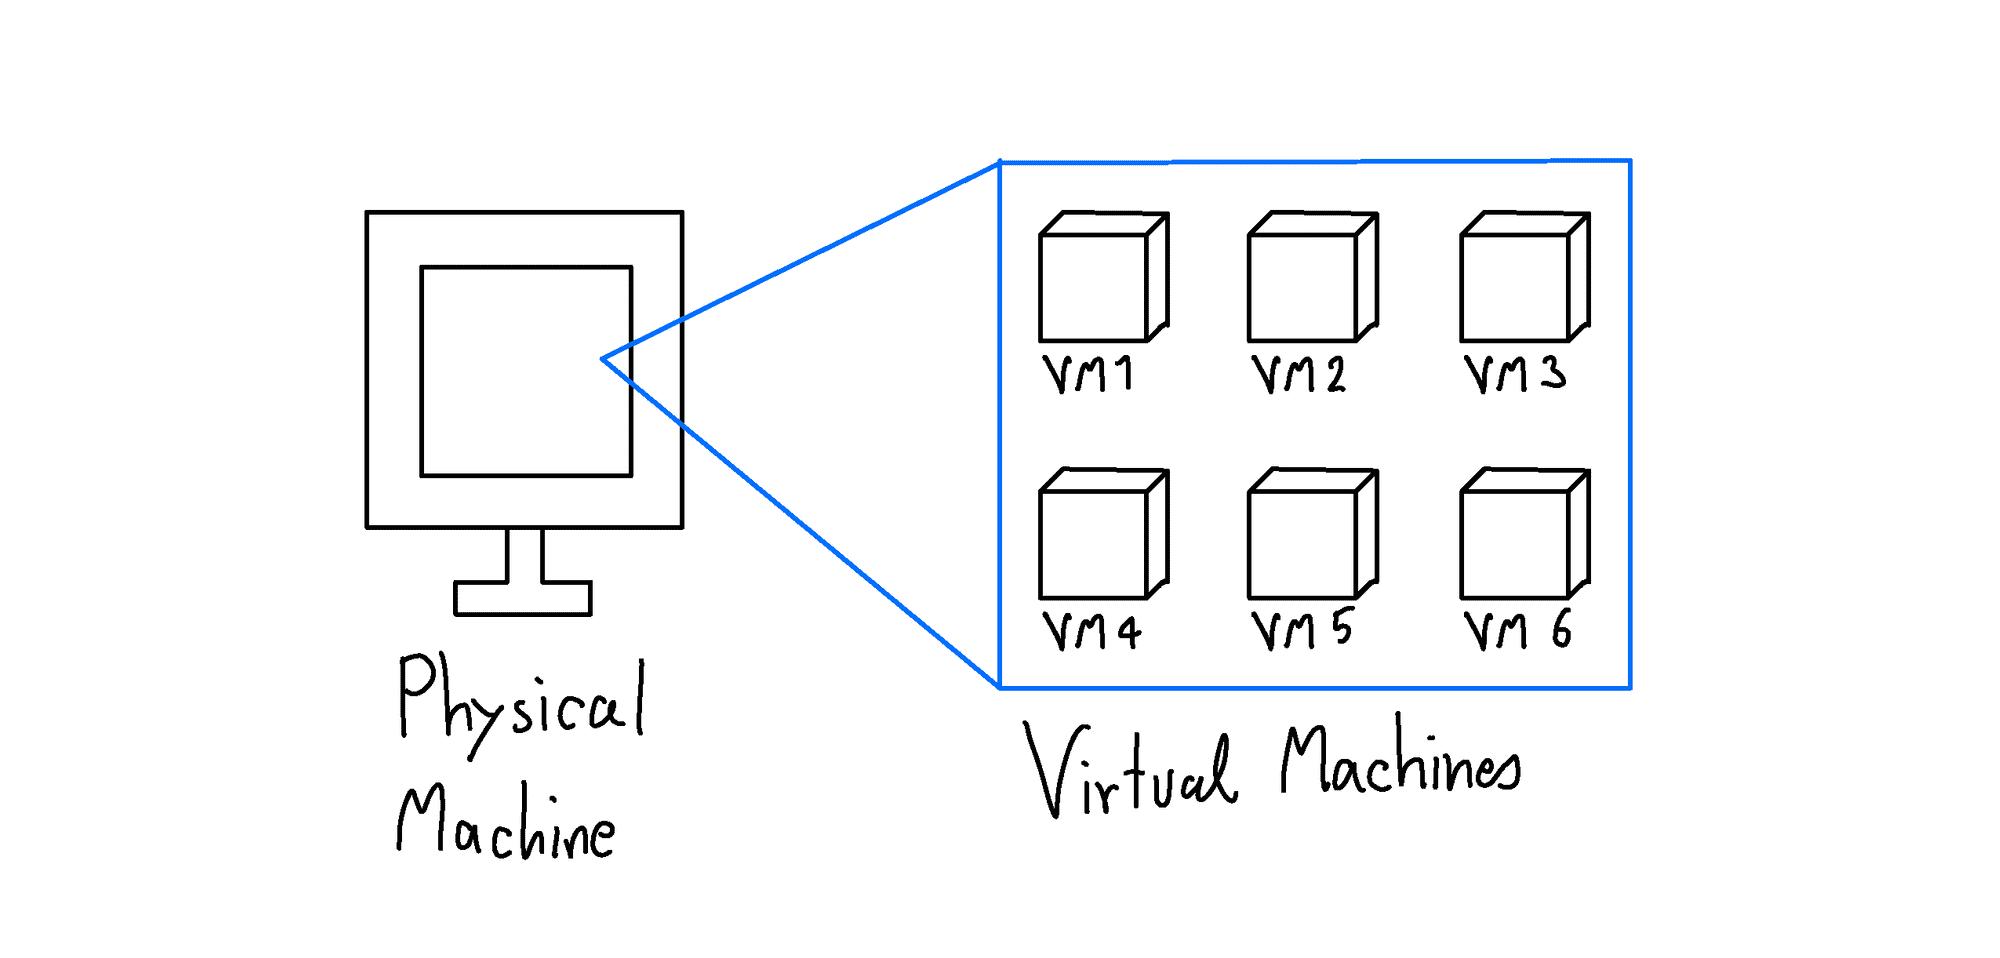 Physical Machine VS Virtual Machine